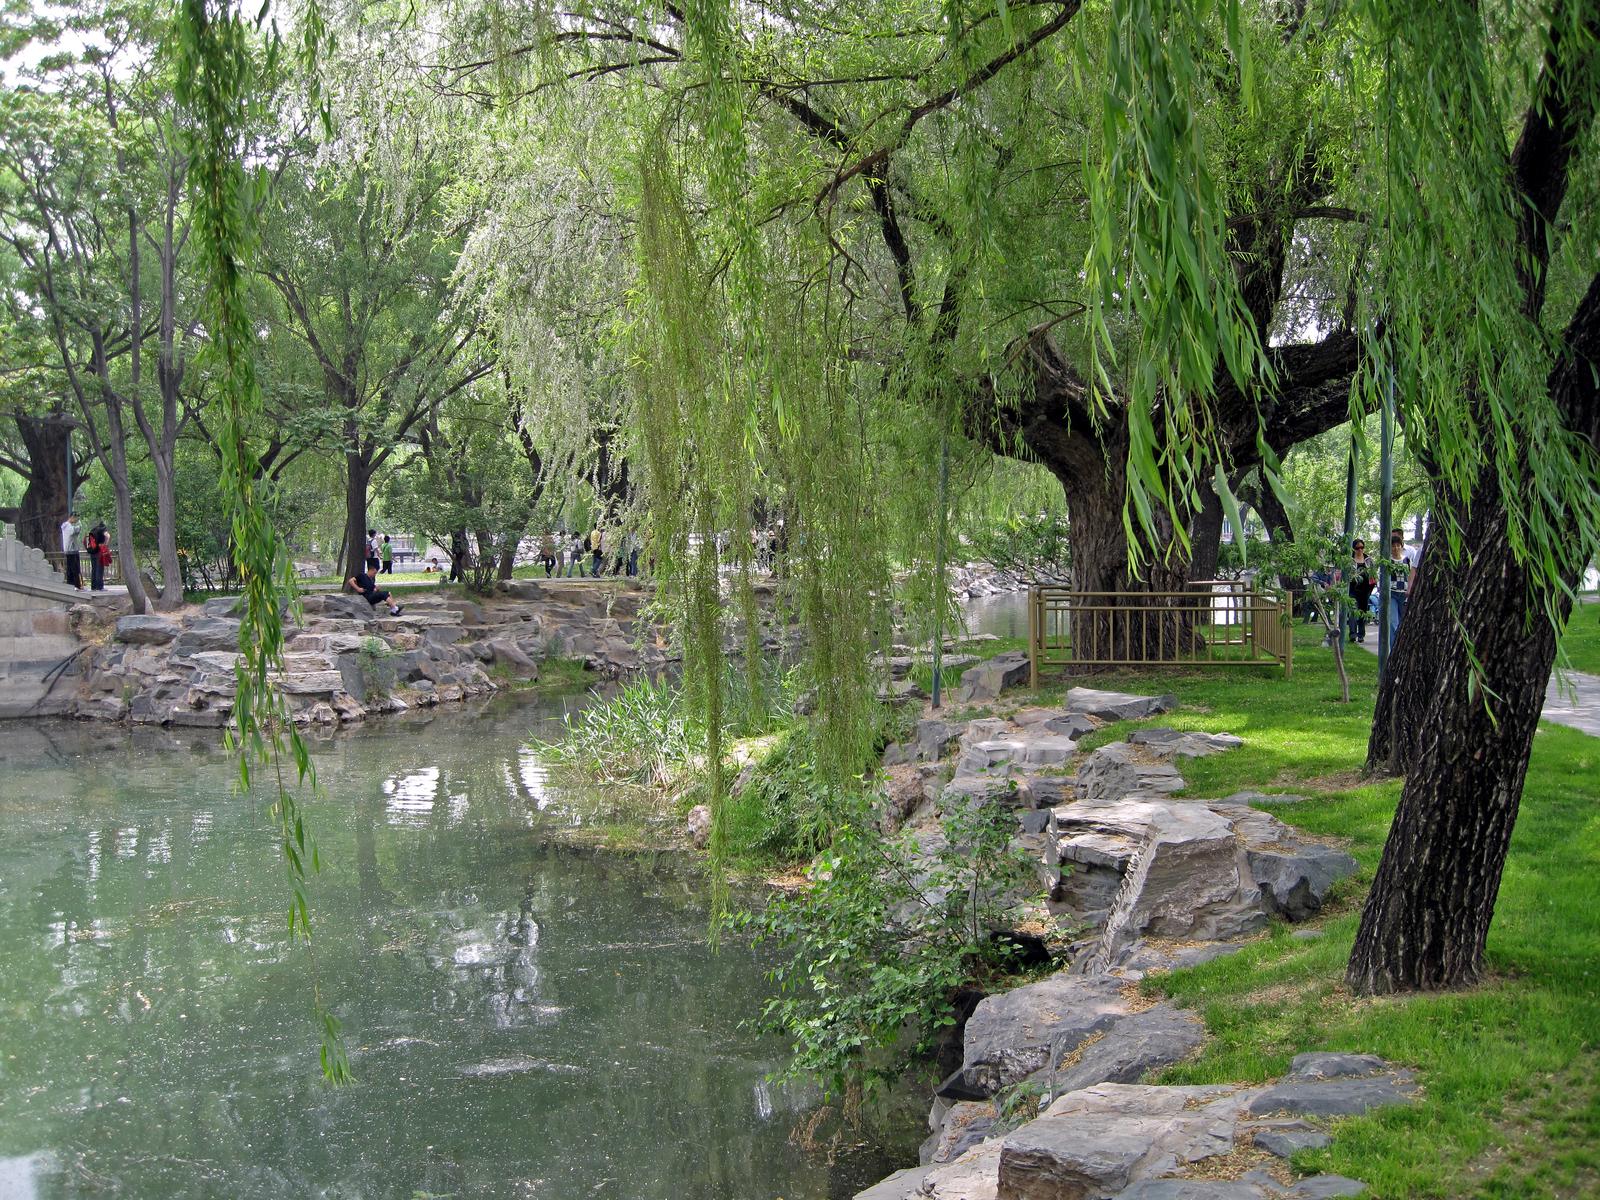 outside Beijing, China